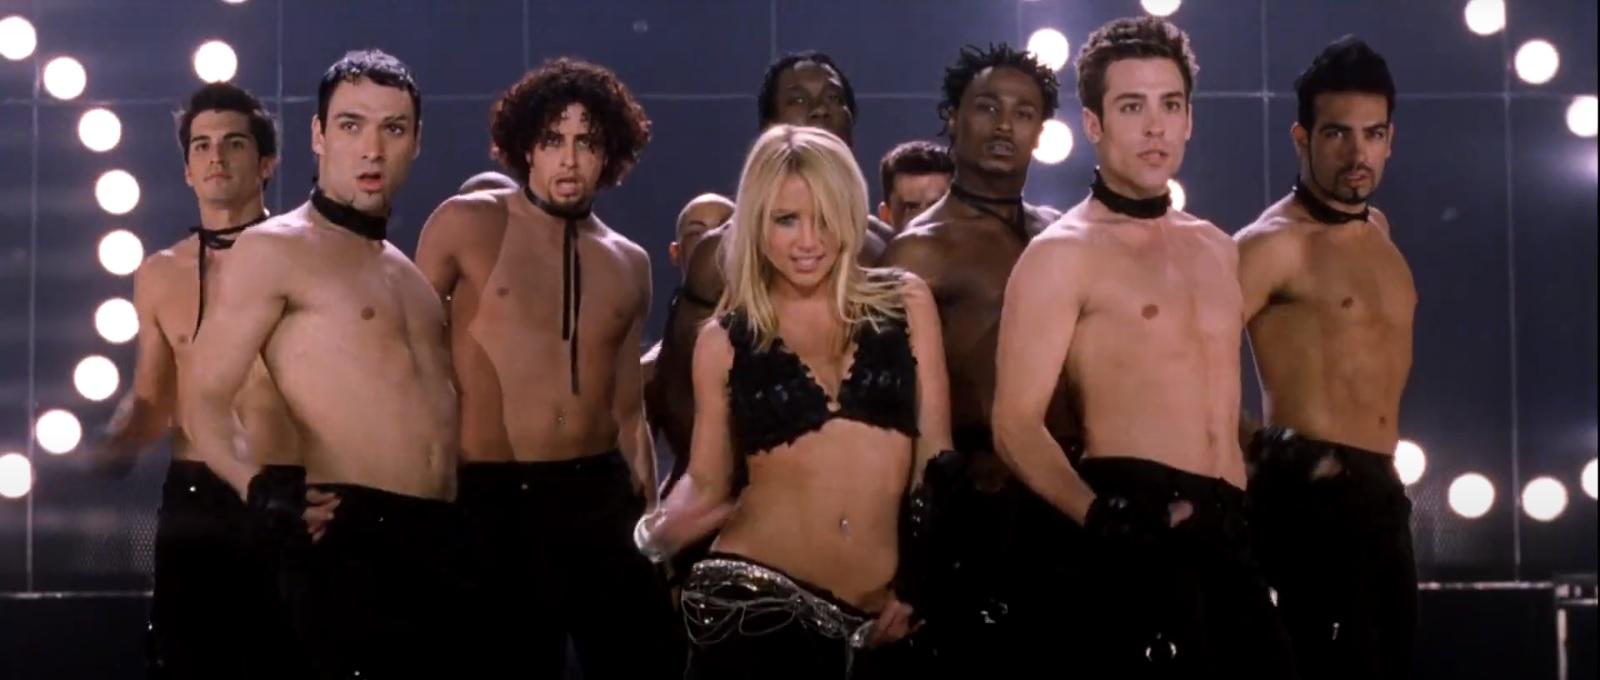 Britney fembot.jpg